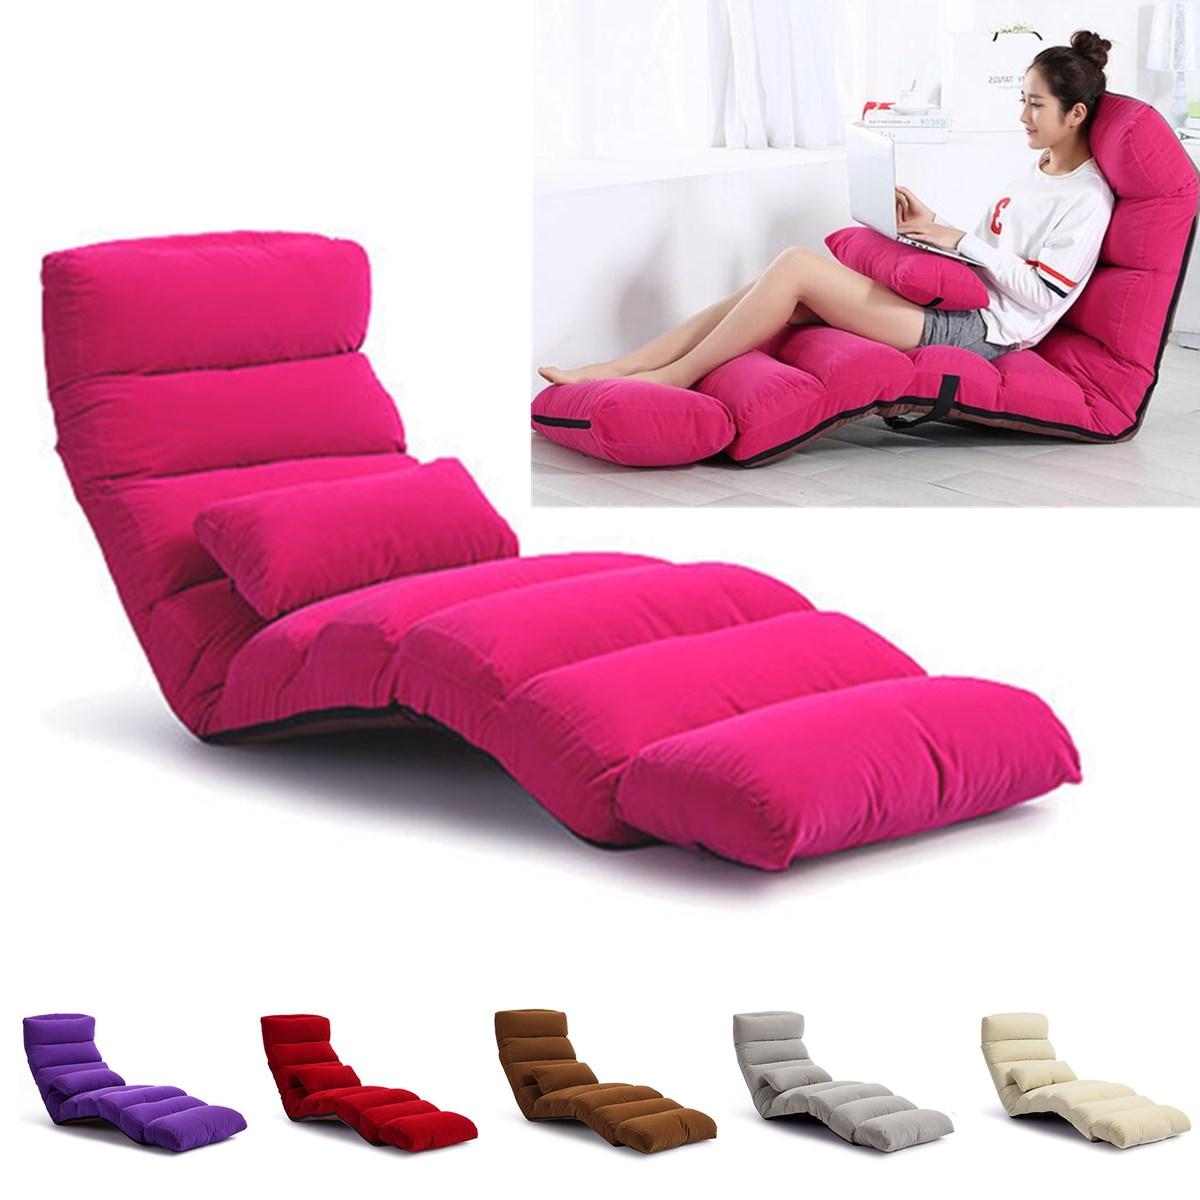 3 Folding Lazy Sofa Chair Lounger Seat Bean Bag Tatami